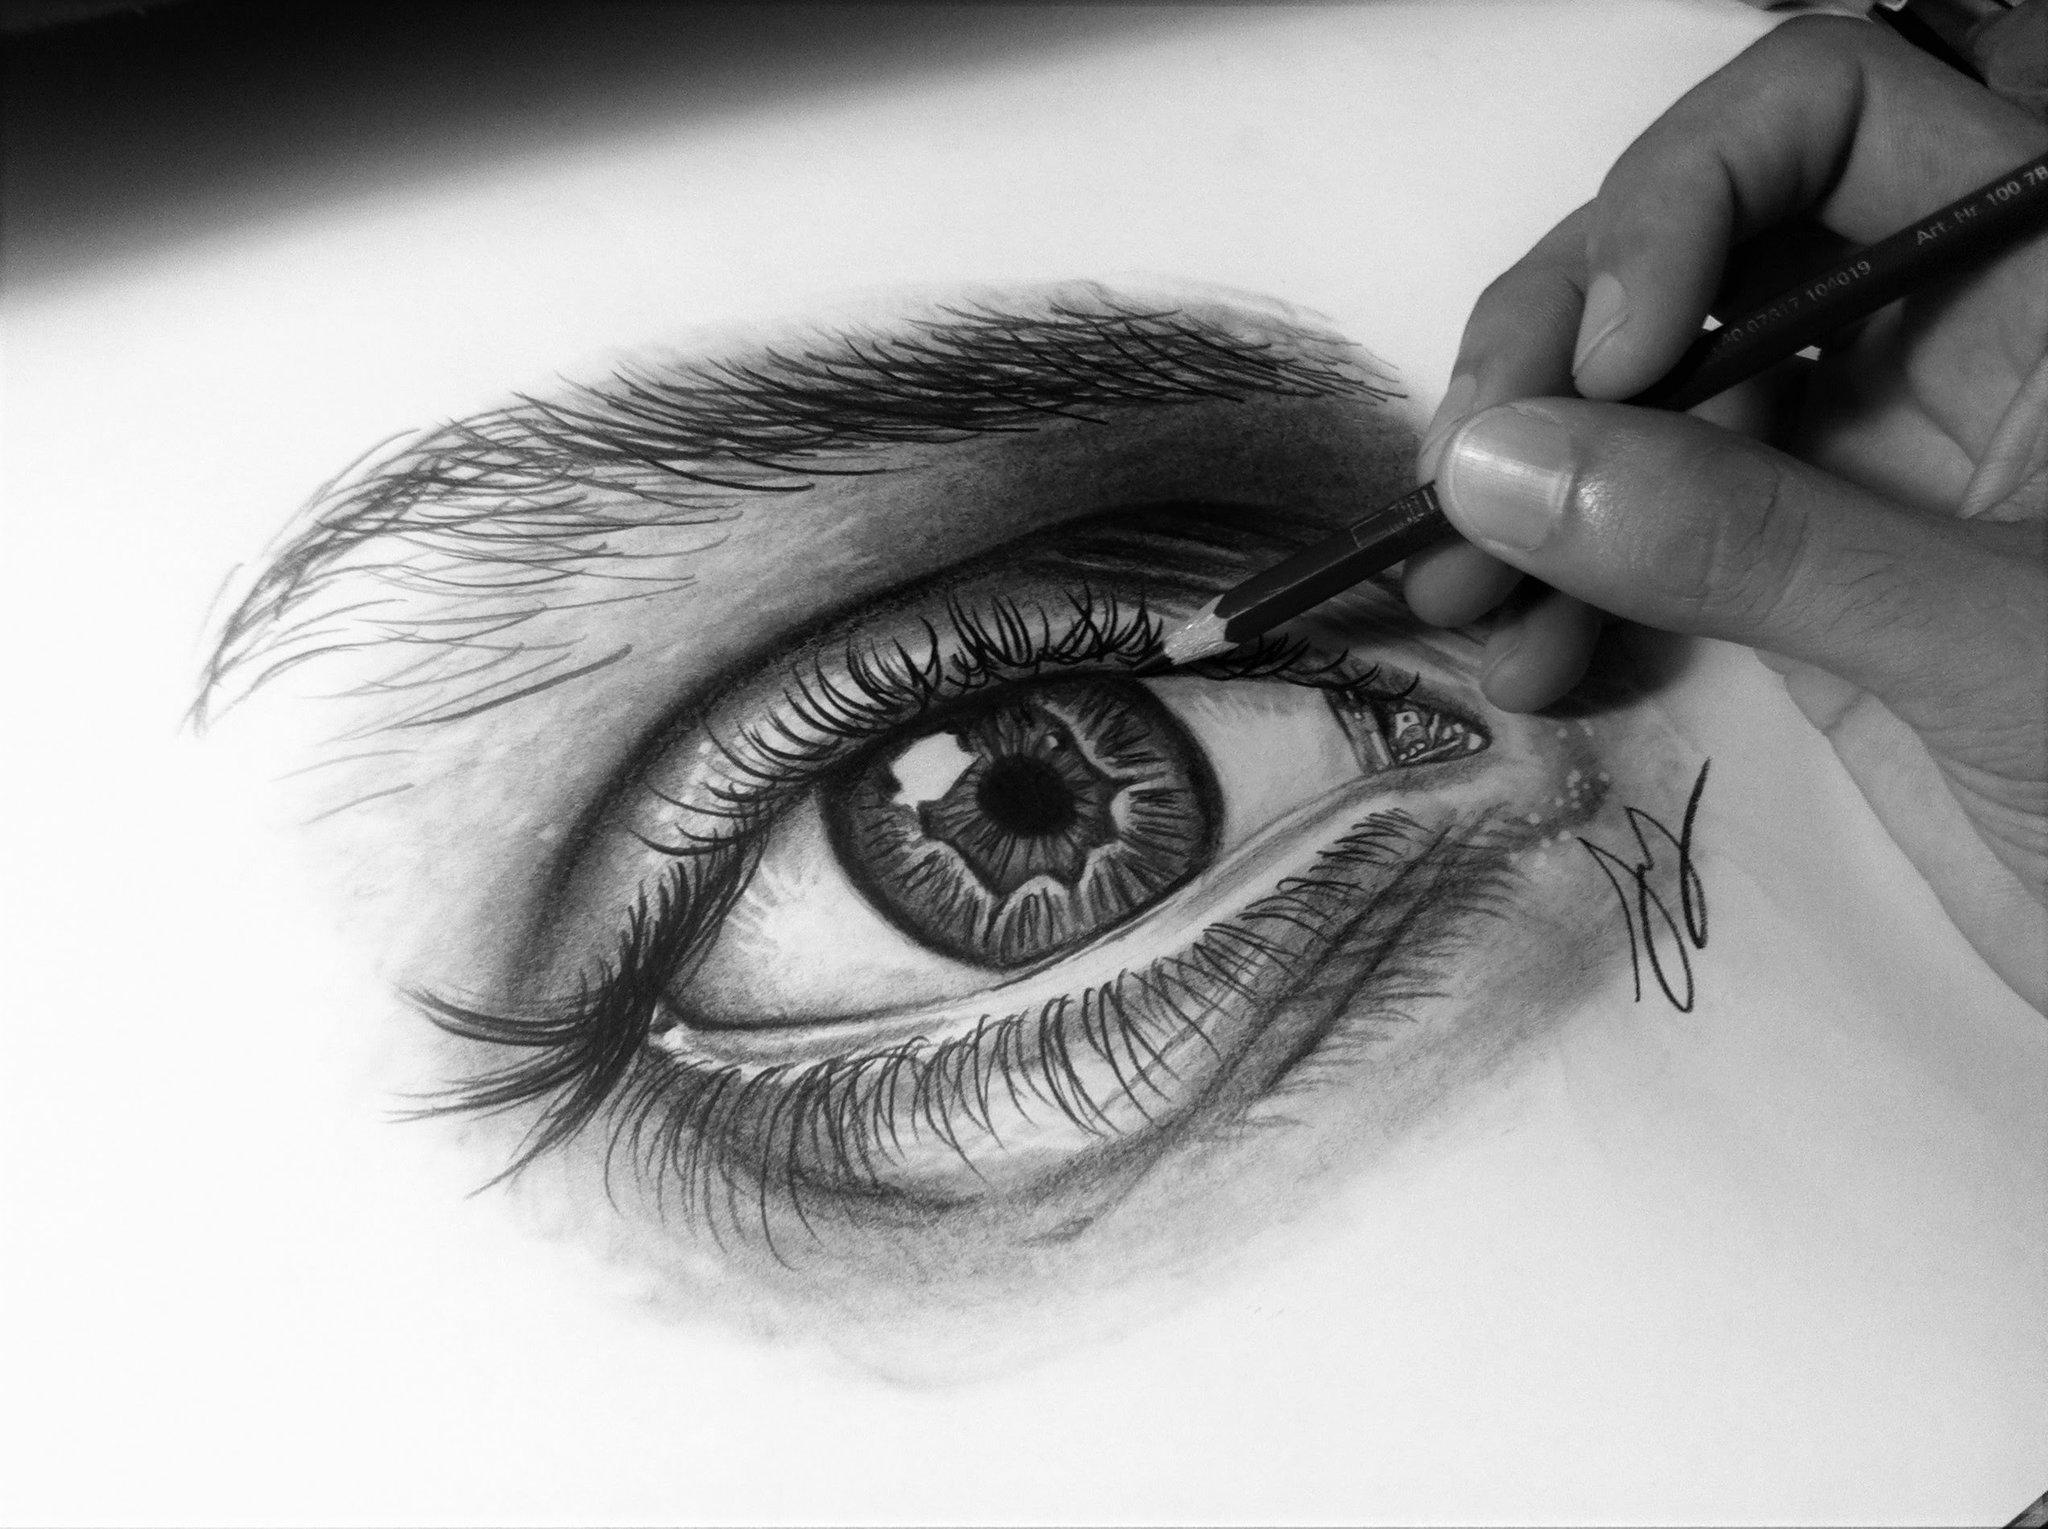 девушка реалистичные рисунки простым карандашом оставили уехали город